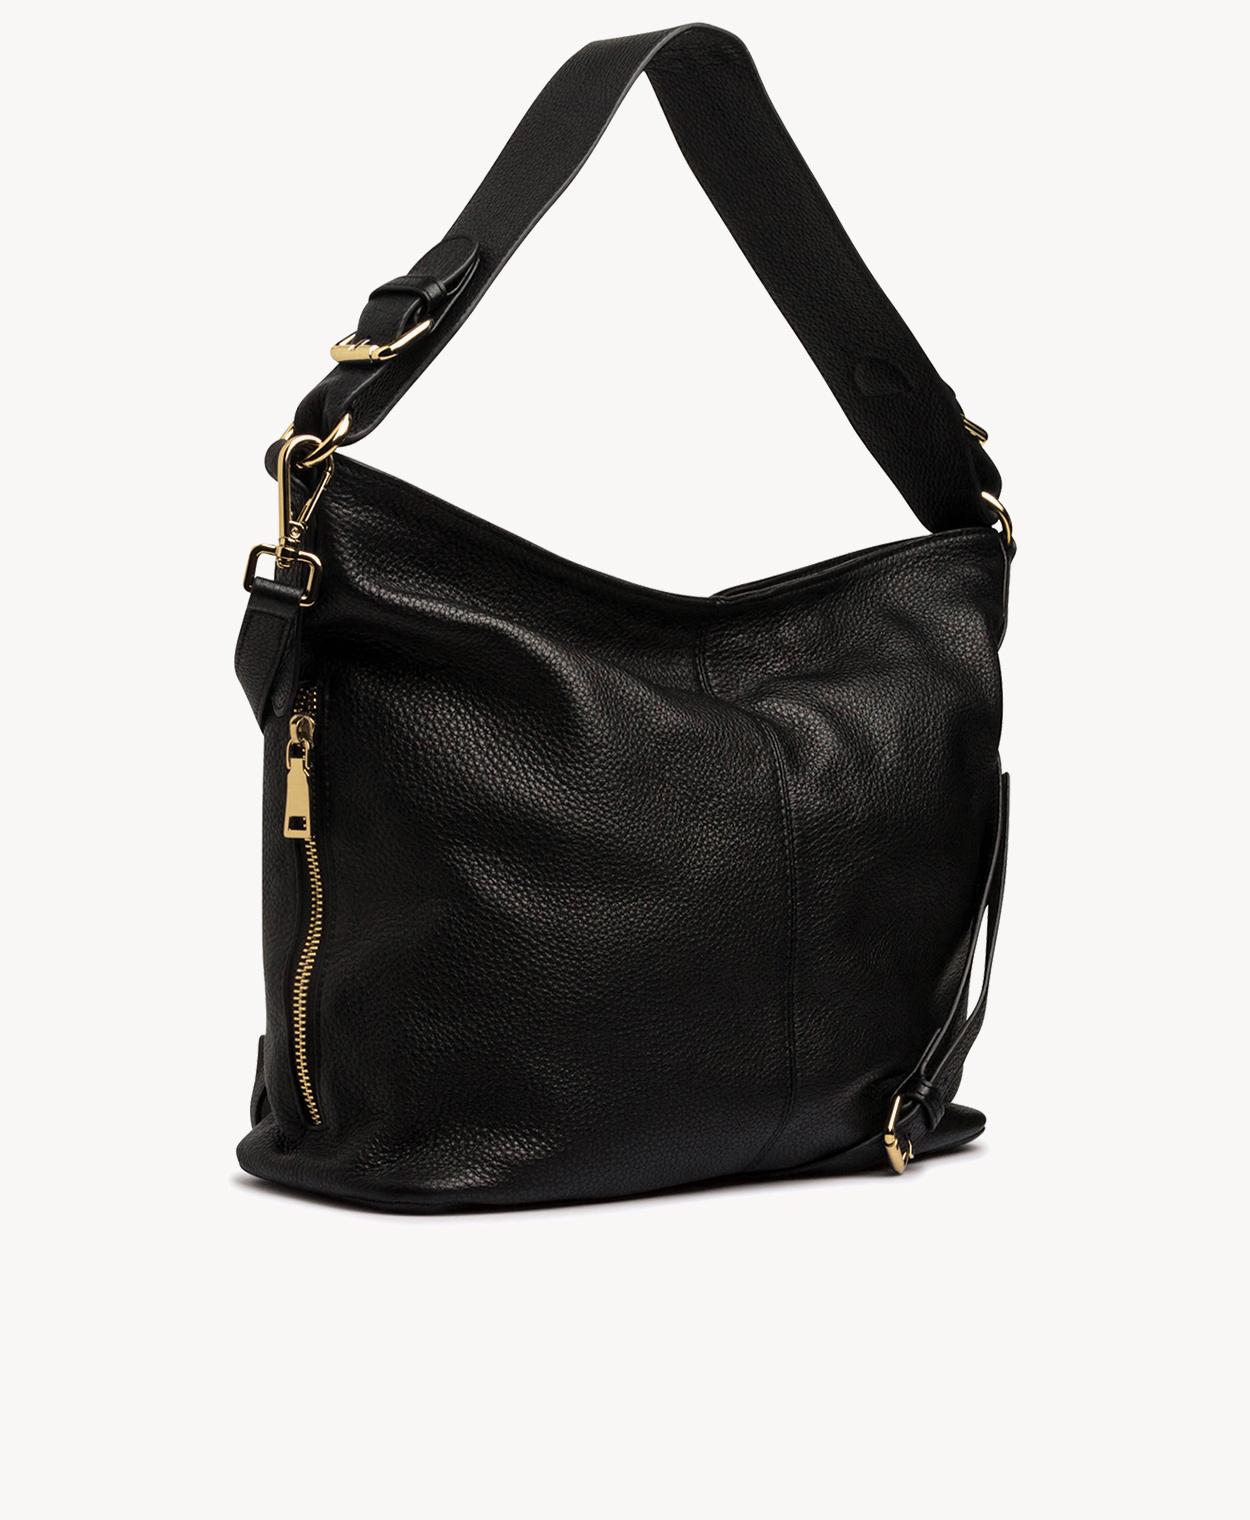 fde34990fd Womens Handbags Online | Shop Leather Bags & More | Merchant